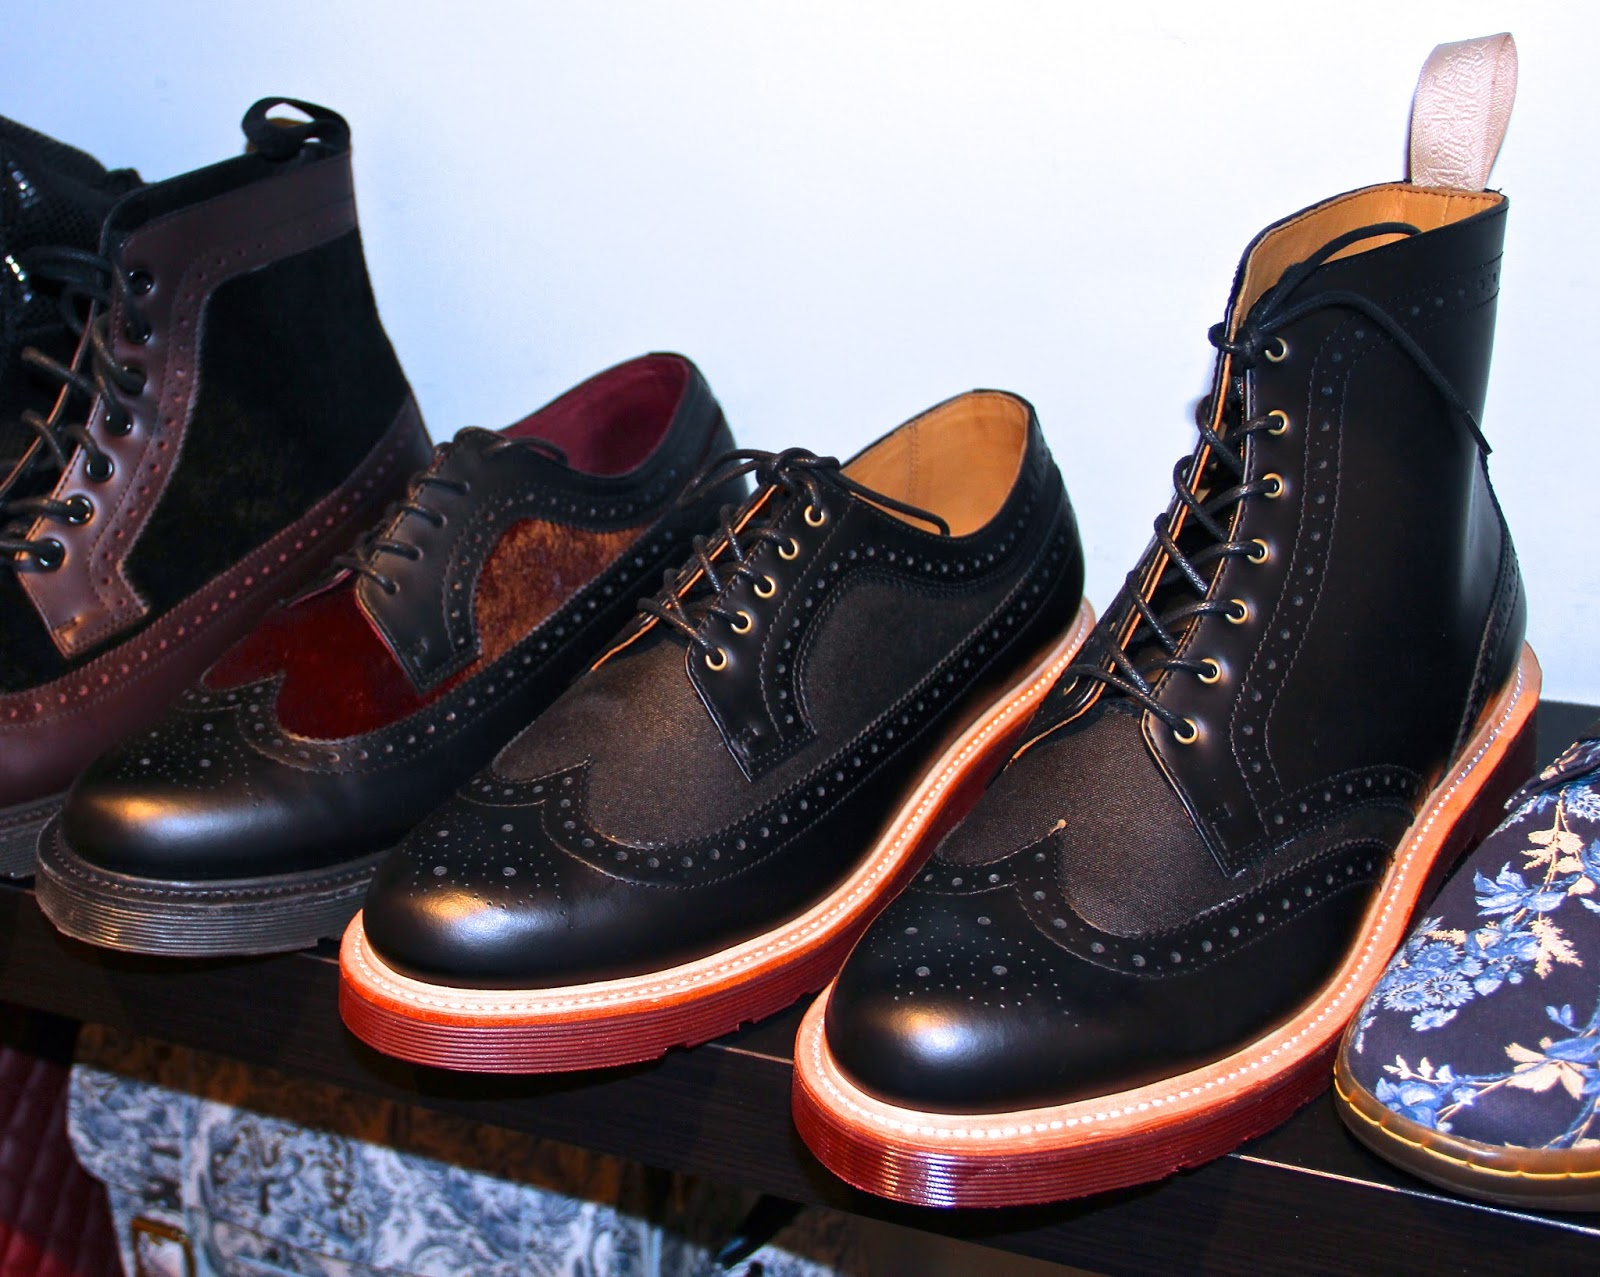 lyra mag dr martens fall 2013 footwear accessories. Black Bedroom Furniture Sets. Home Design Ideas